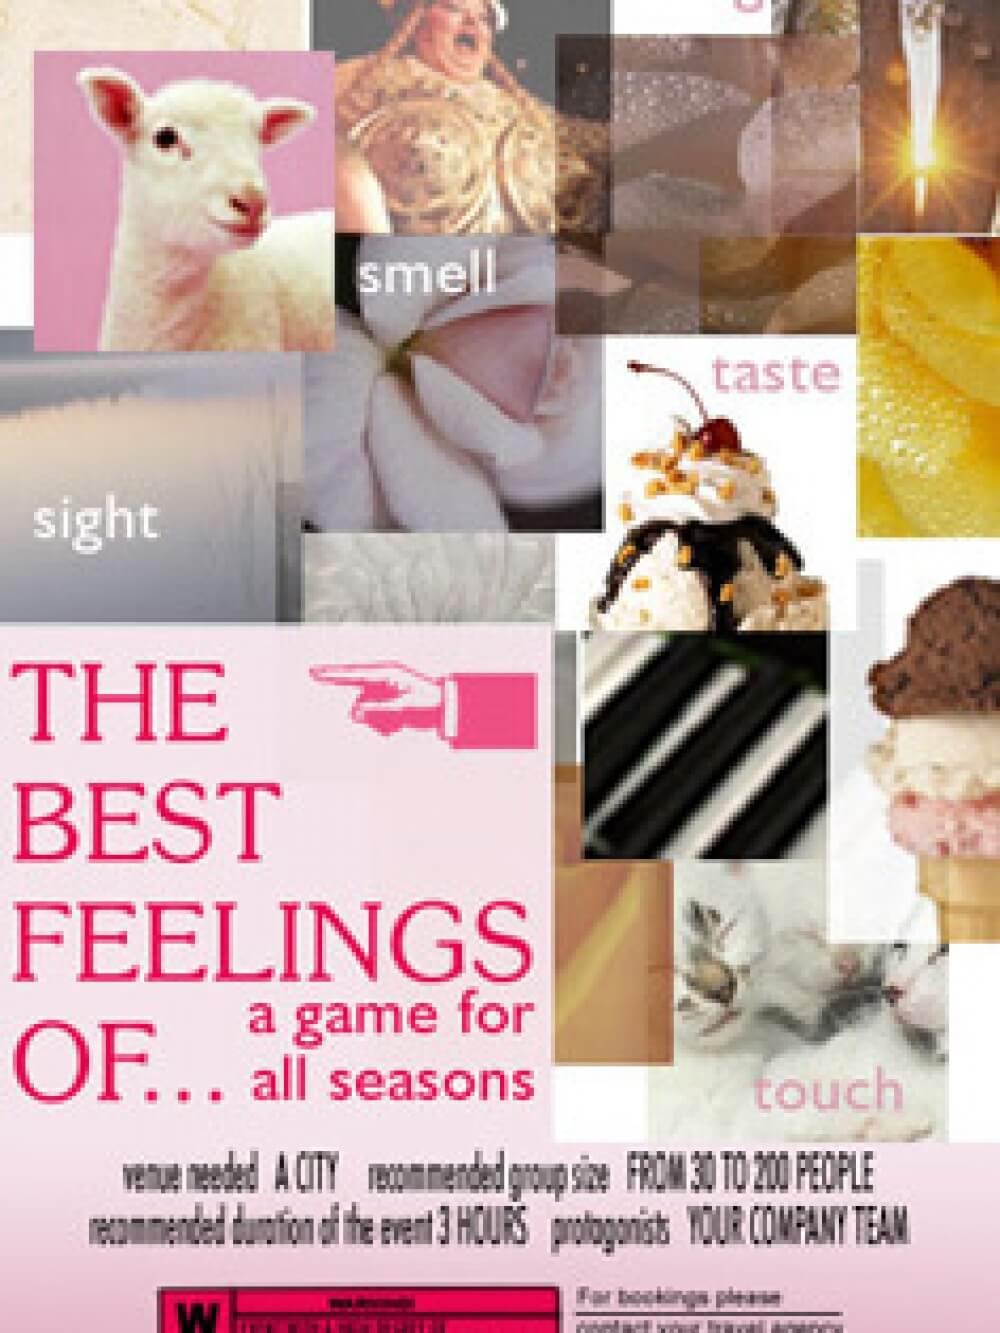 the_best_feelings_of_vertical_web